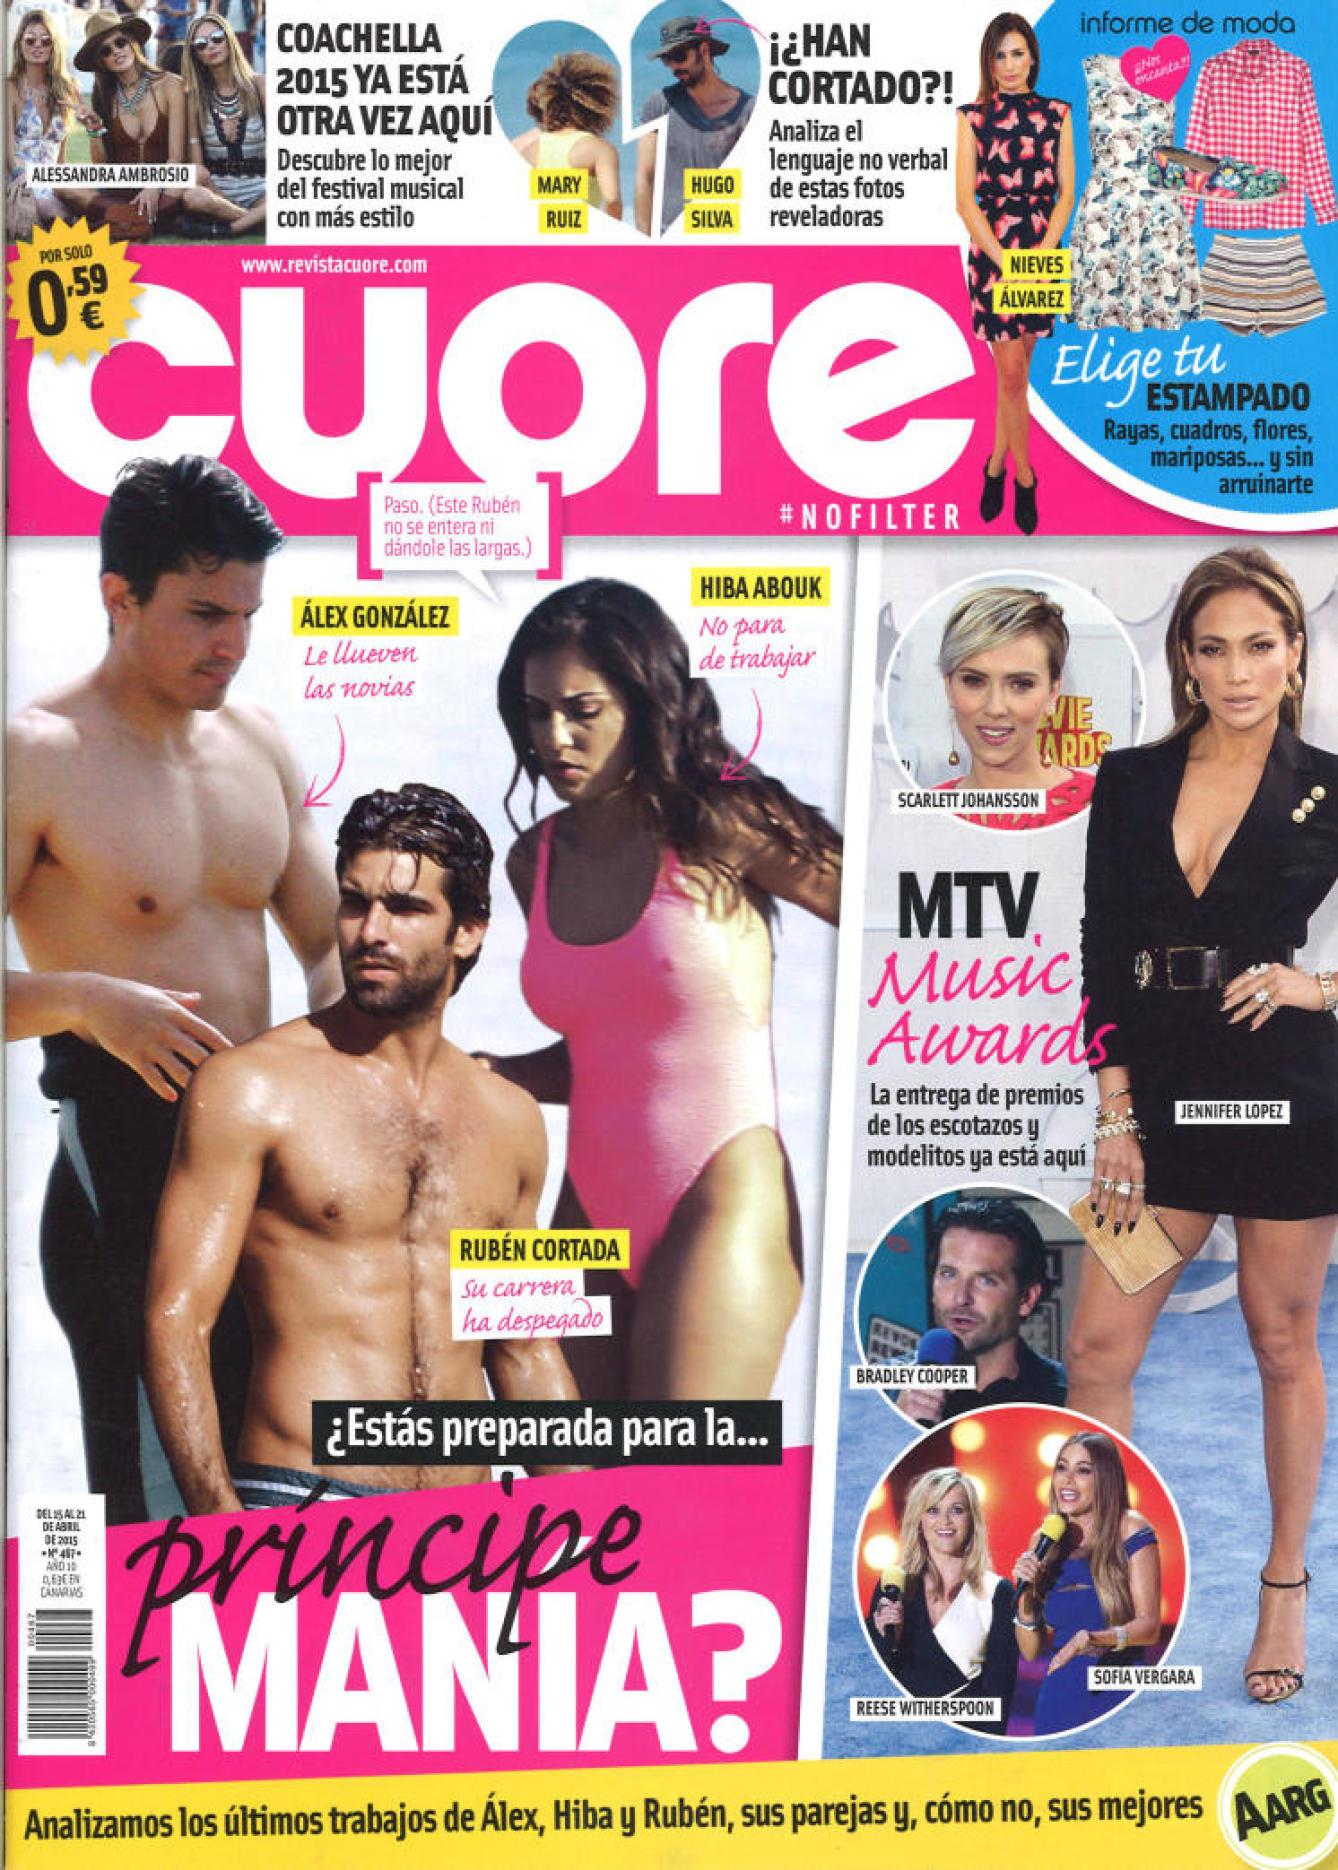 CUORE portada 15 de Abril 2015